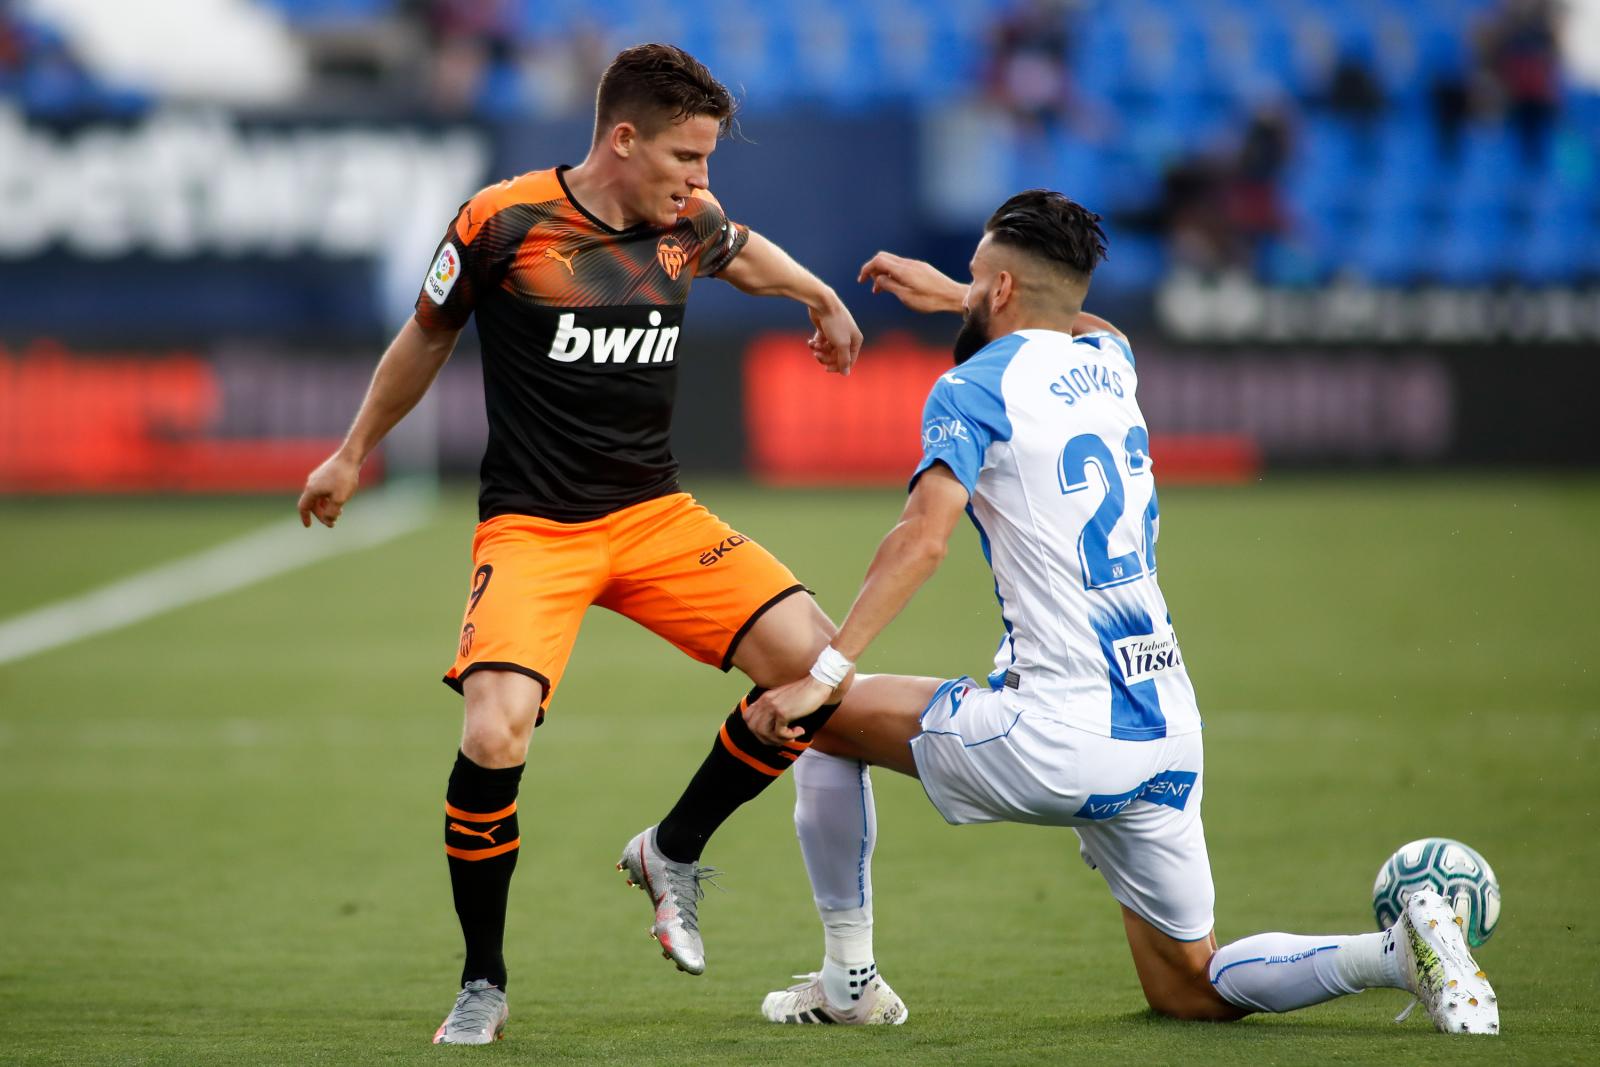 Атлетик Б — Леганес: прогноз на матч 37-го тура Ла Лиги